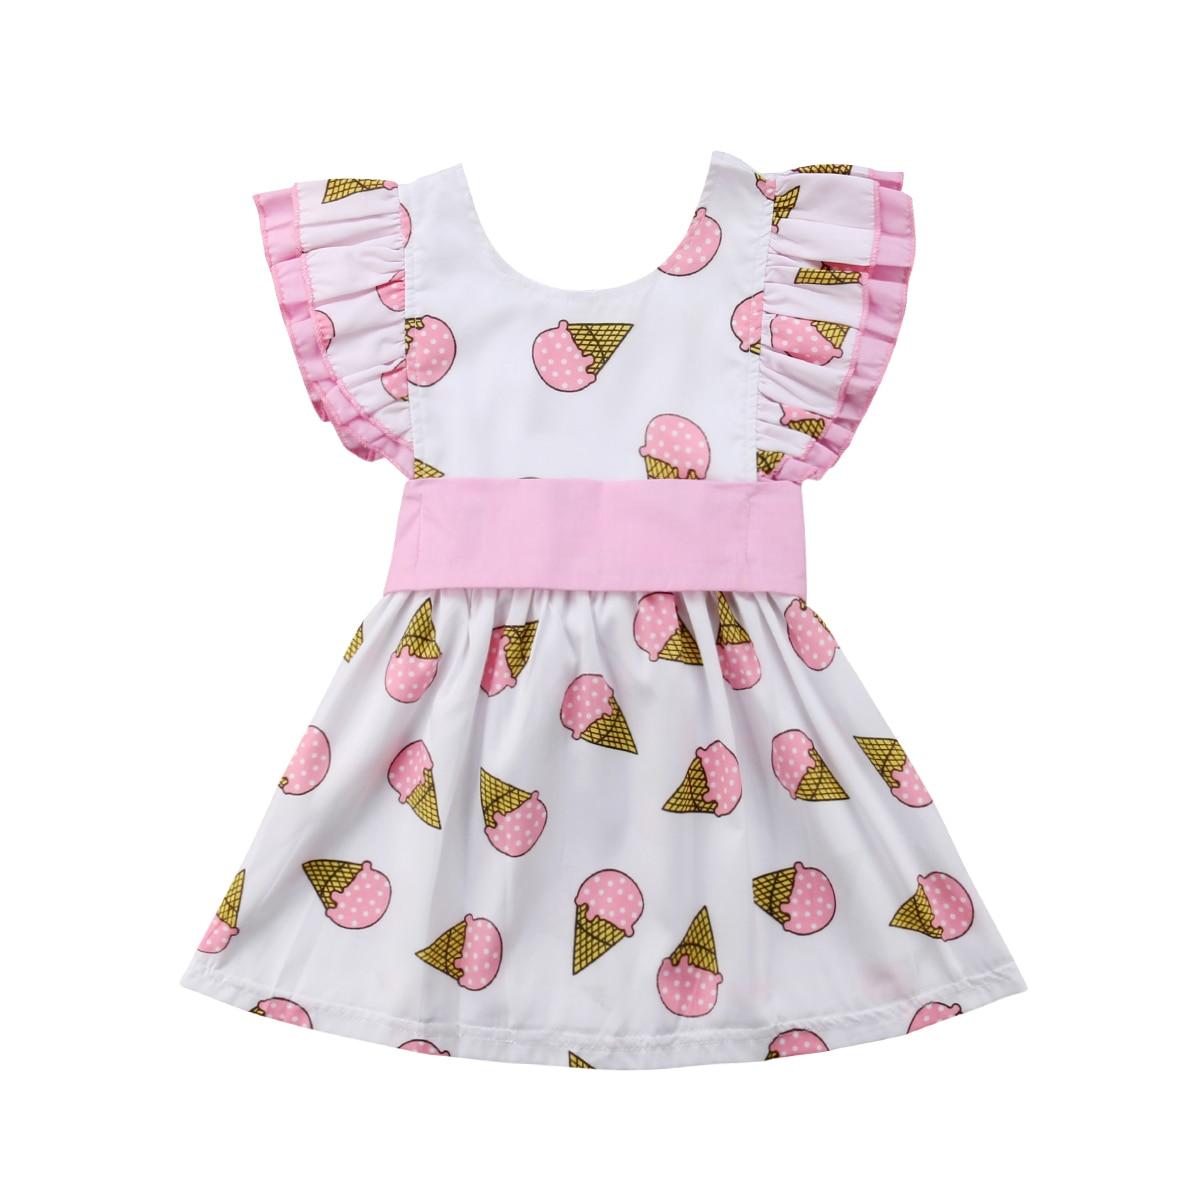 Newly Toddler Baby Girls Summer Sweet Lovely Dress Ruffles Petal Sleeve Ice Cream Print Bow Pink A-Line Knee-Length Dress